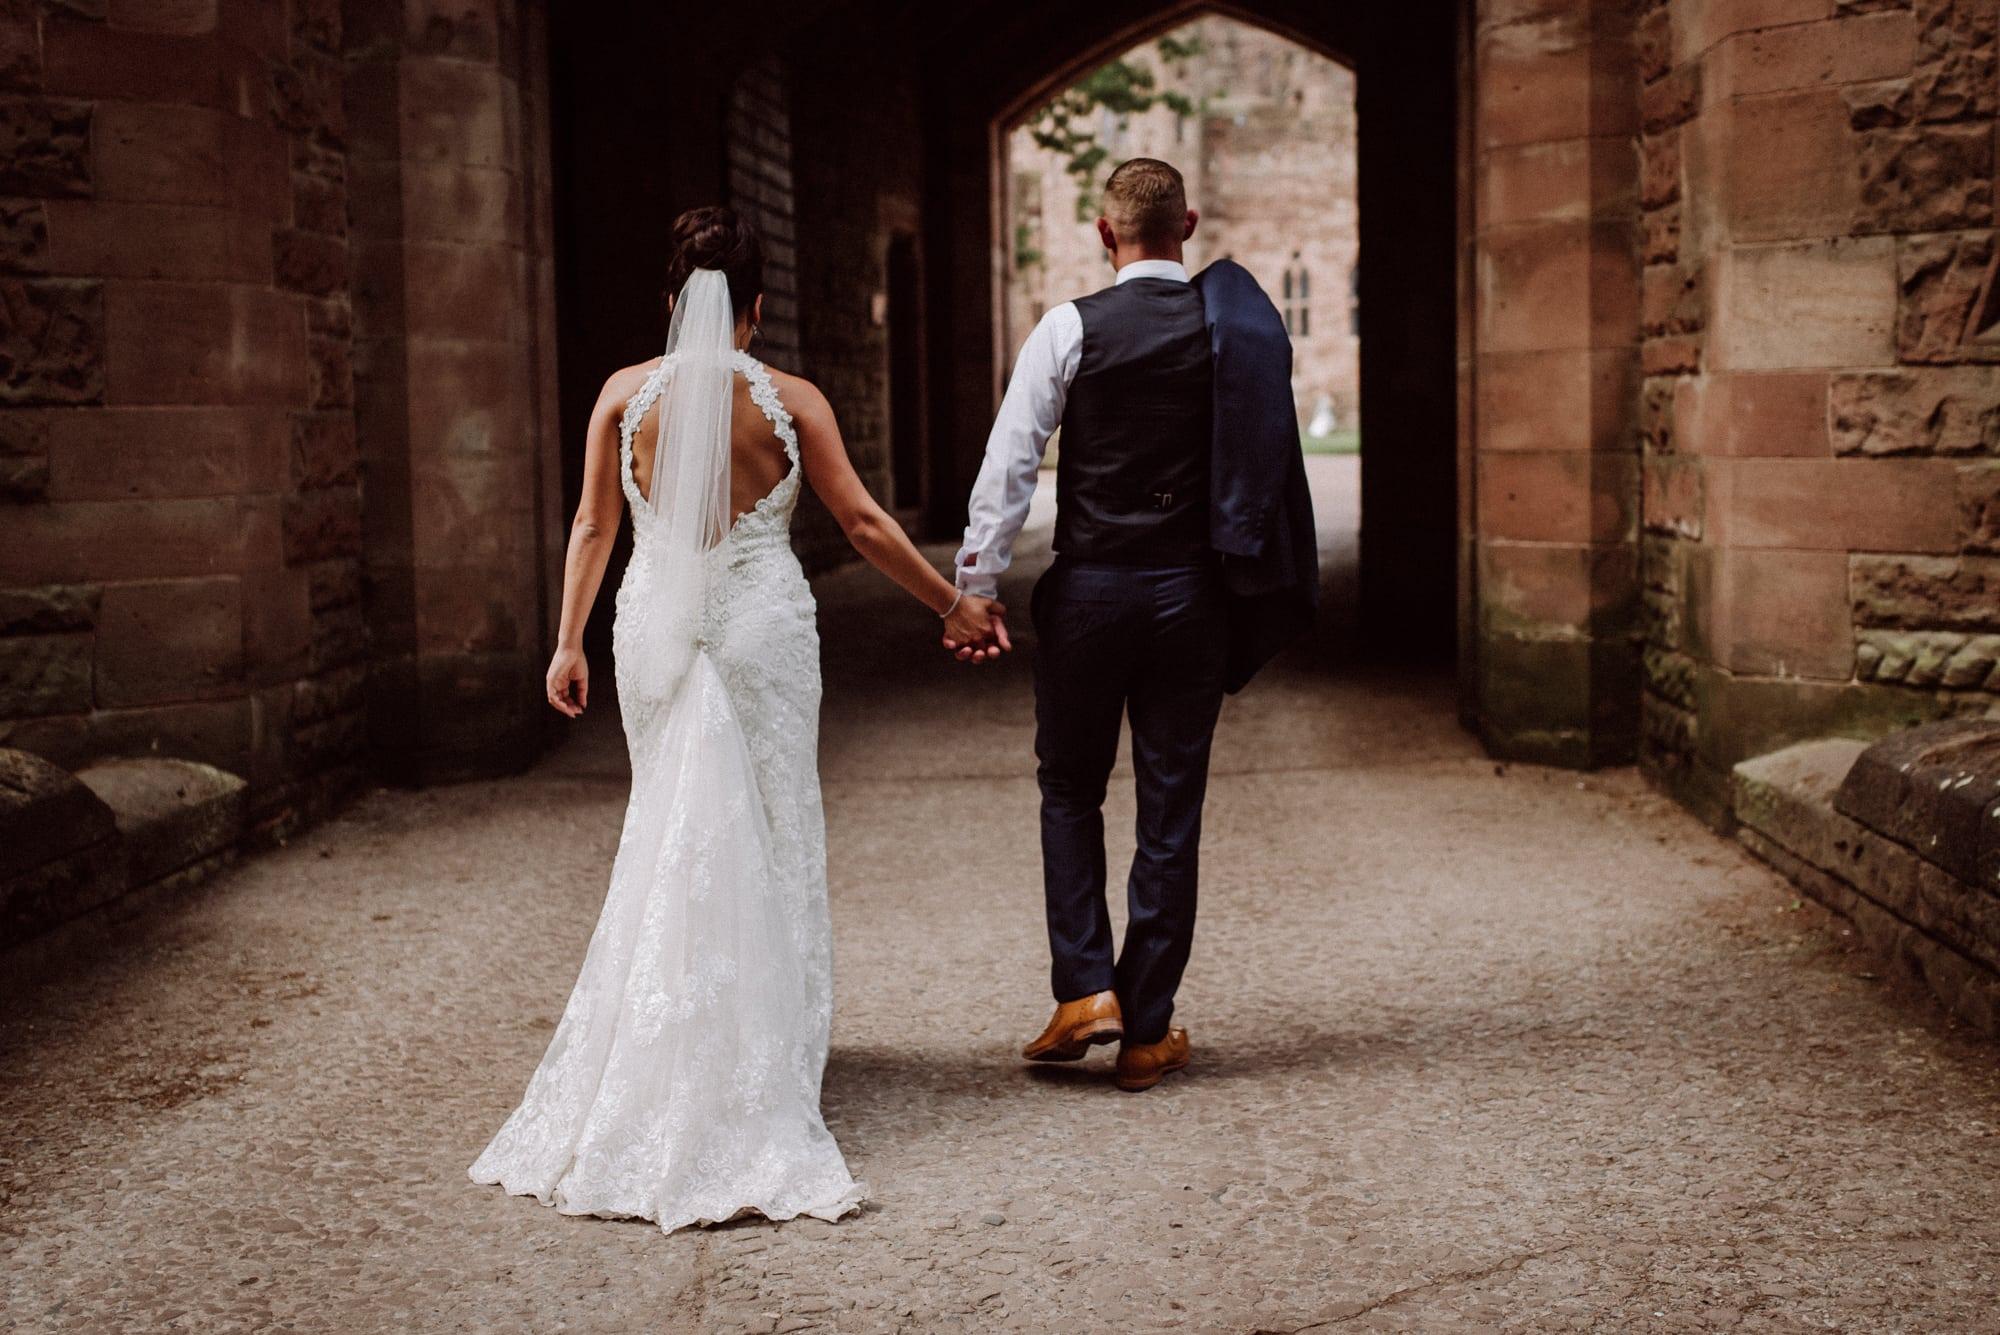 Couples Portraits at Peckfurton Castle Tianna J-Williams Photography